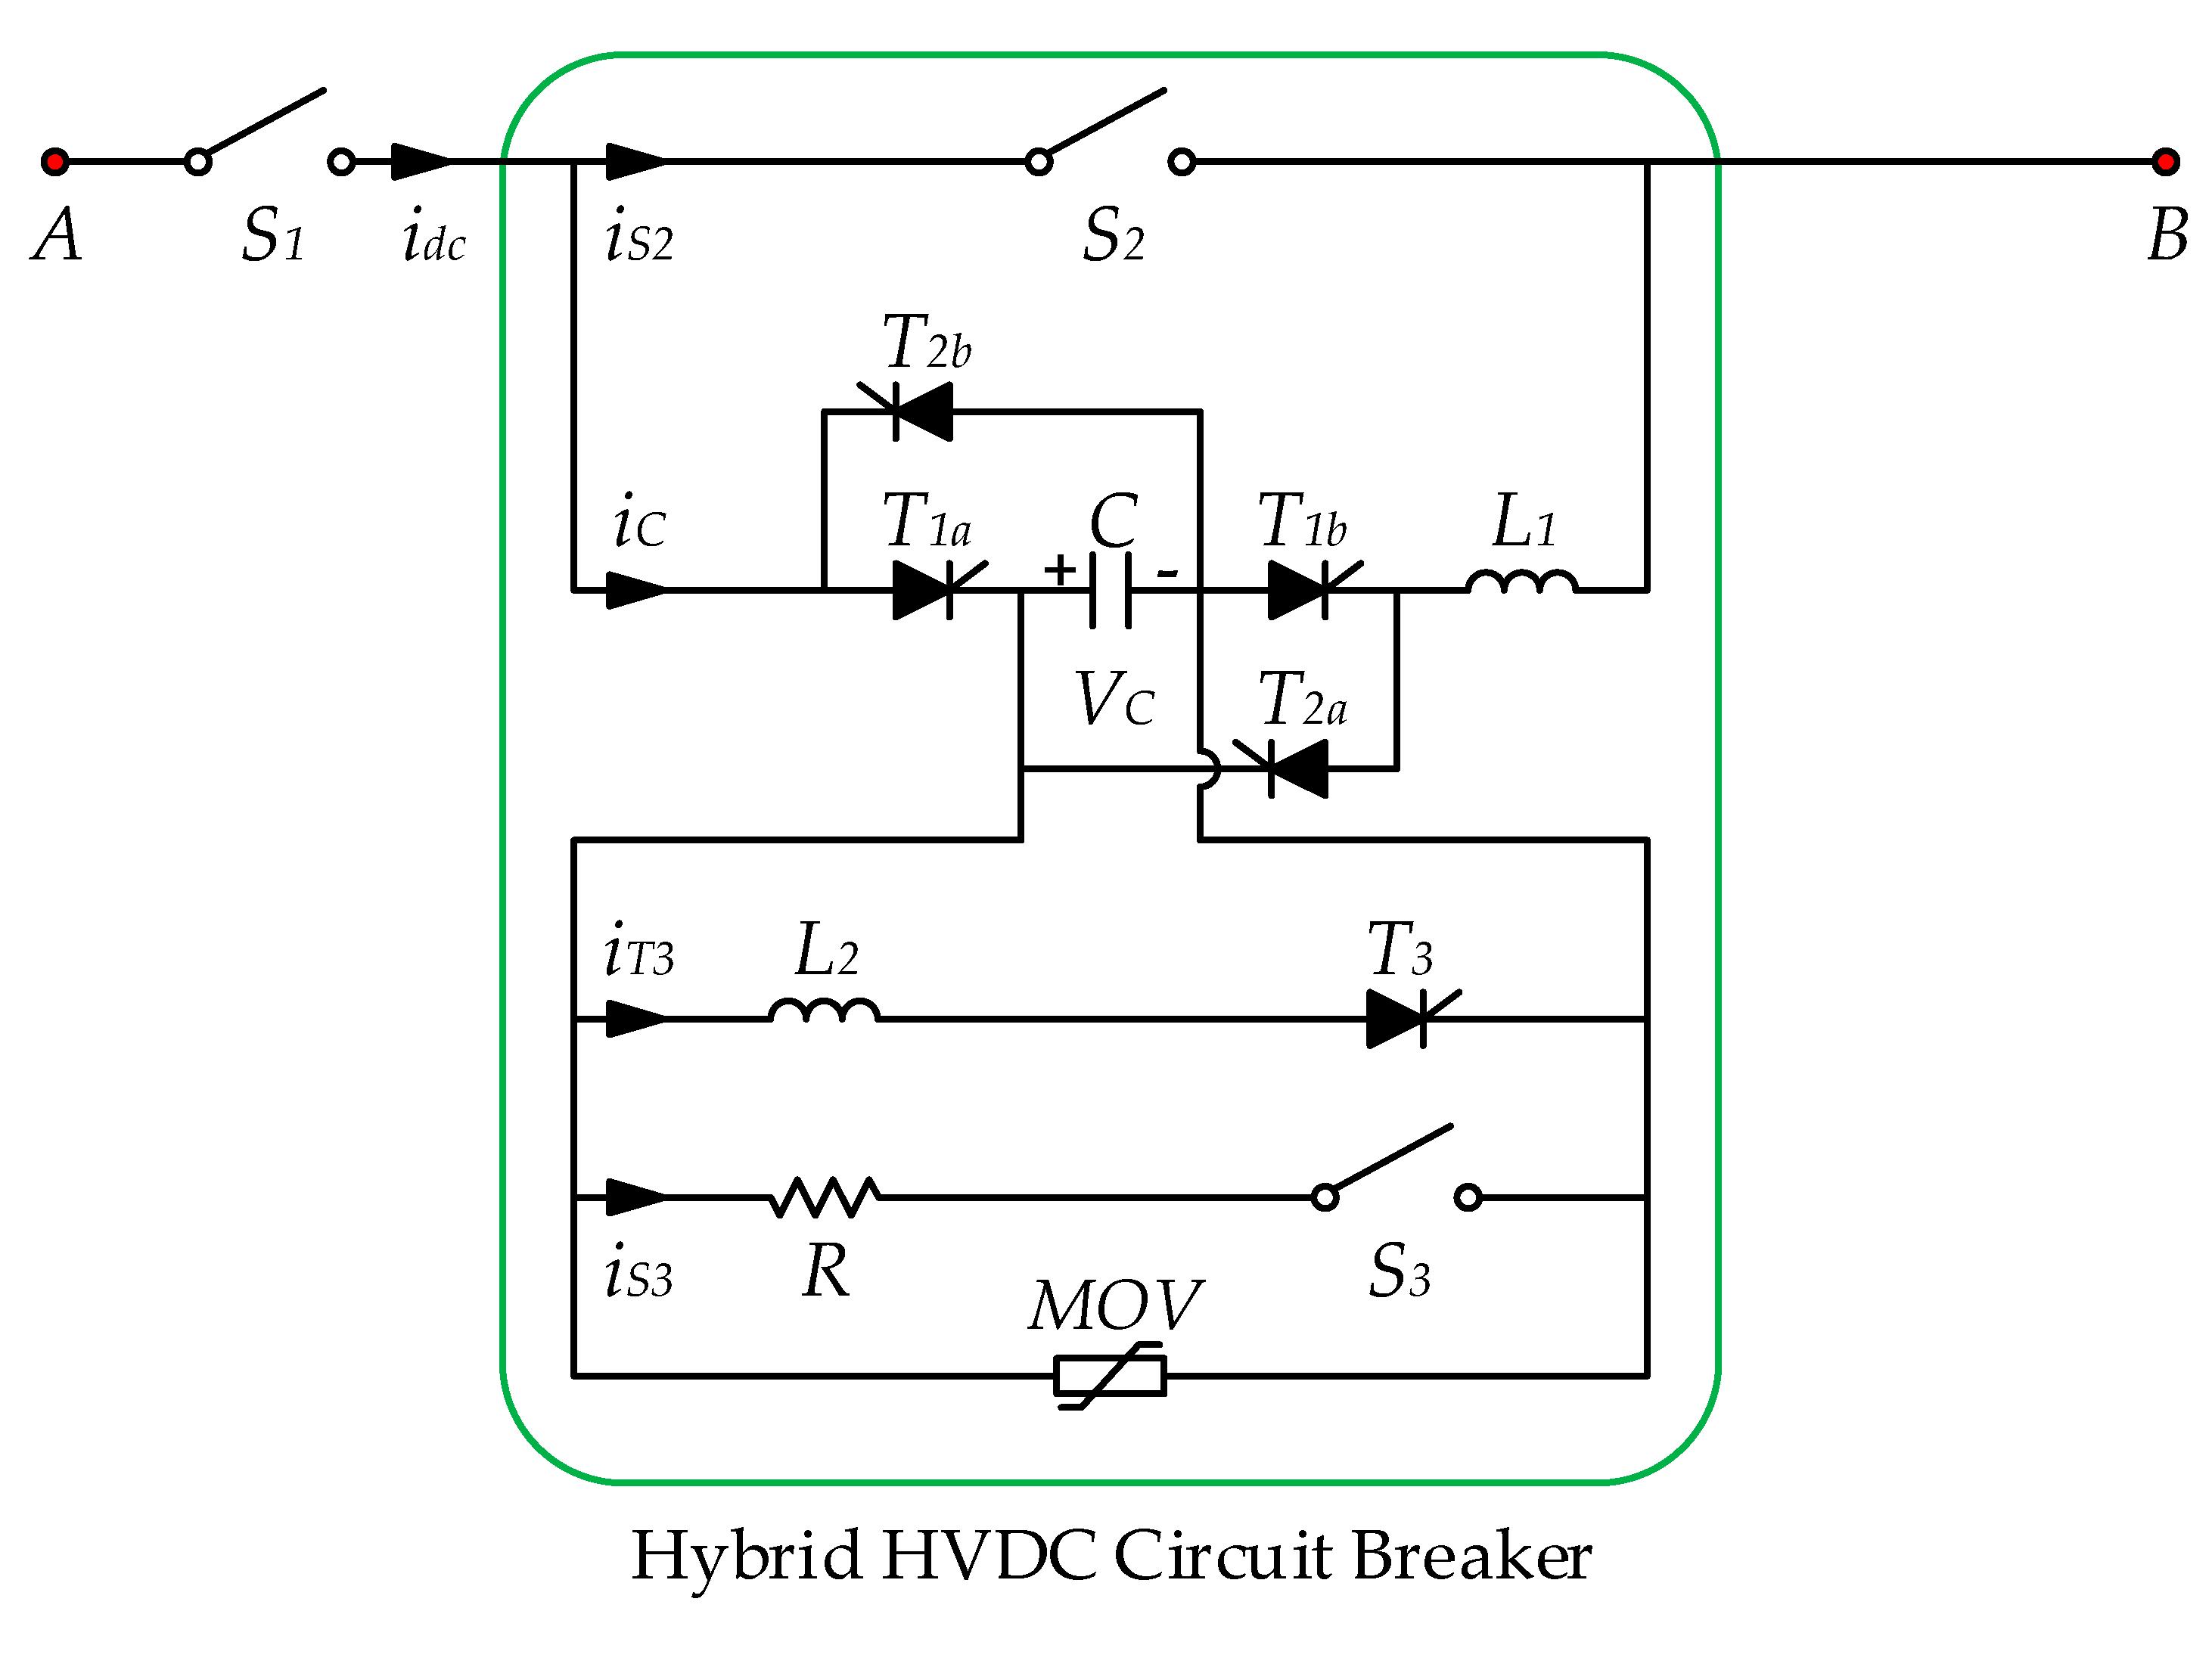 Energies Free Full Text A Novel Topology Of Hybrid Hvdc Circuit Line Breaker No